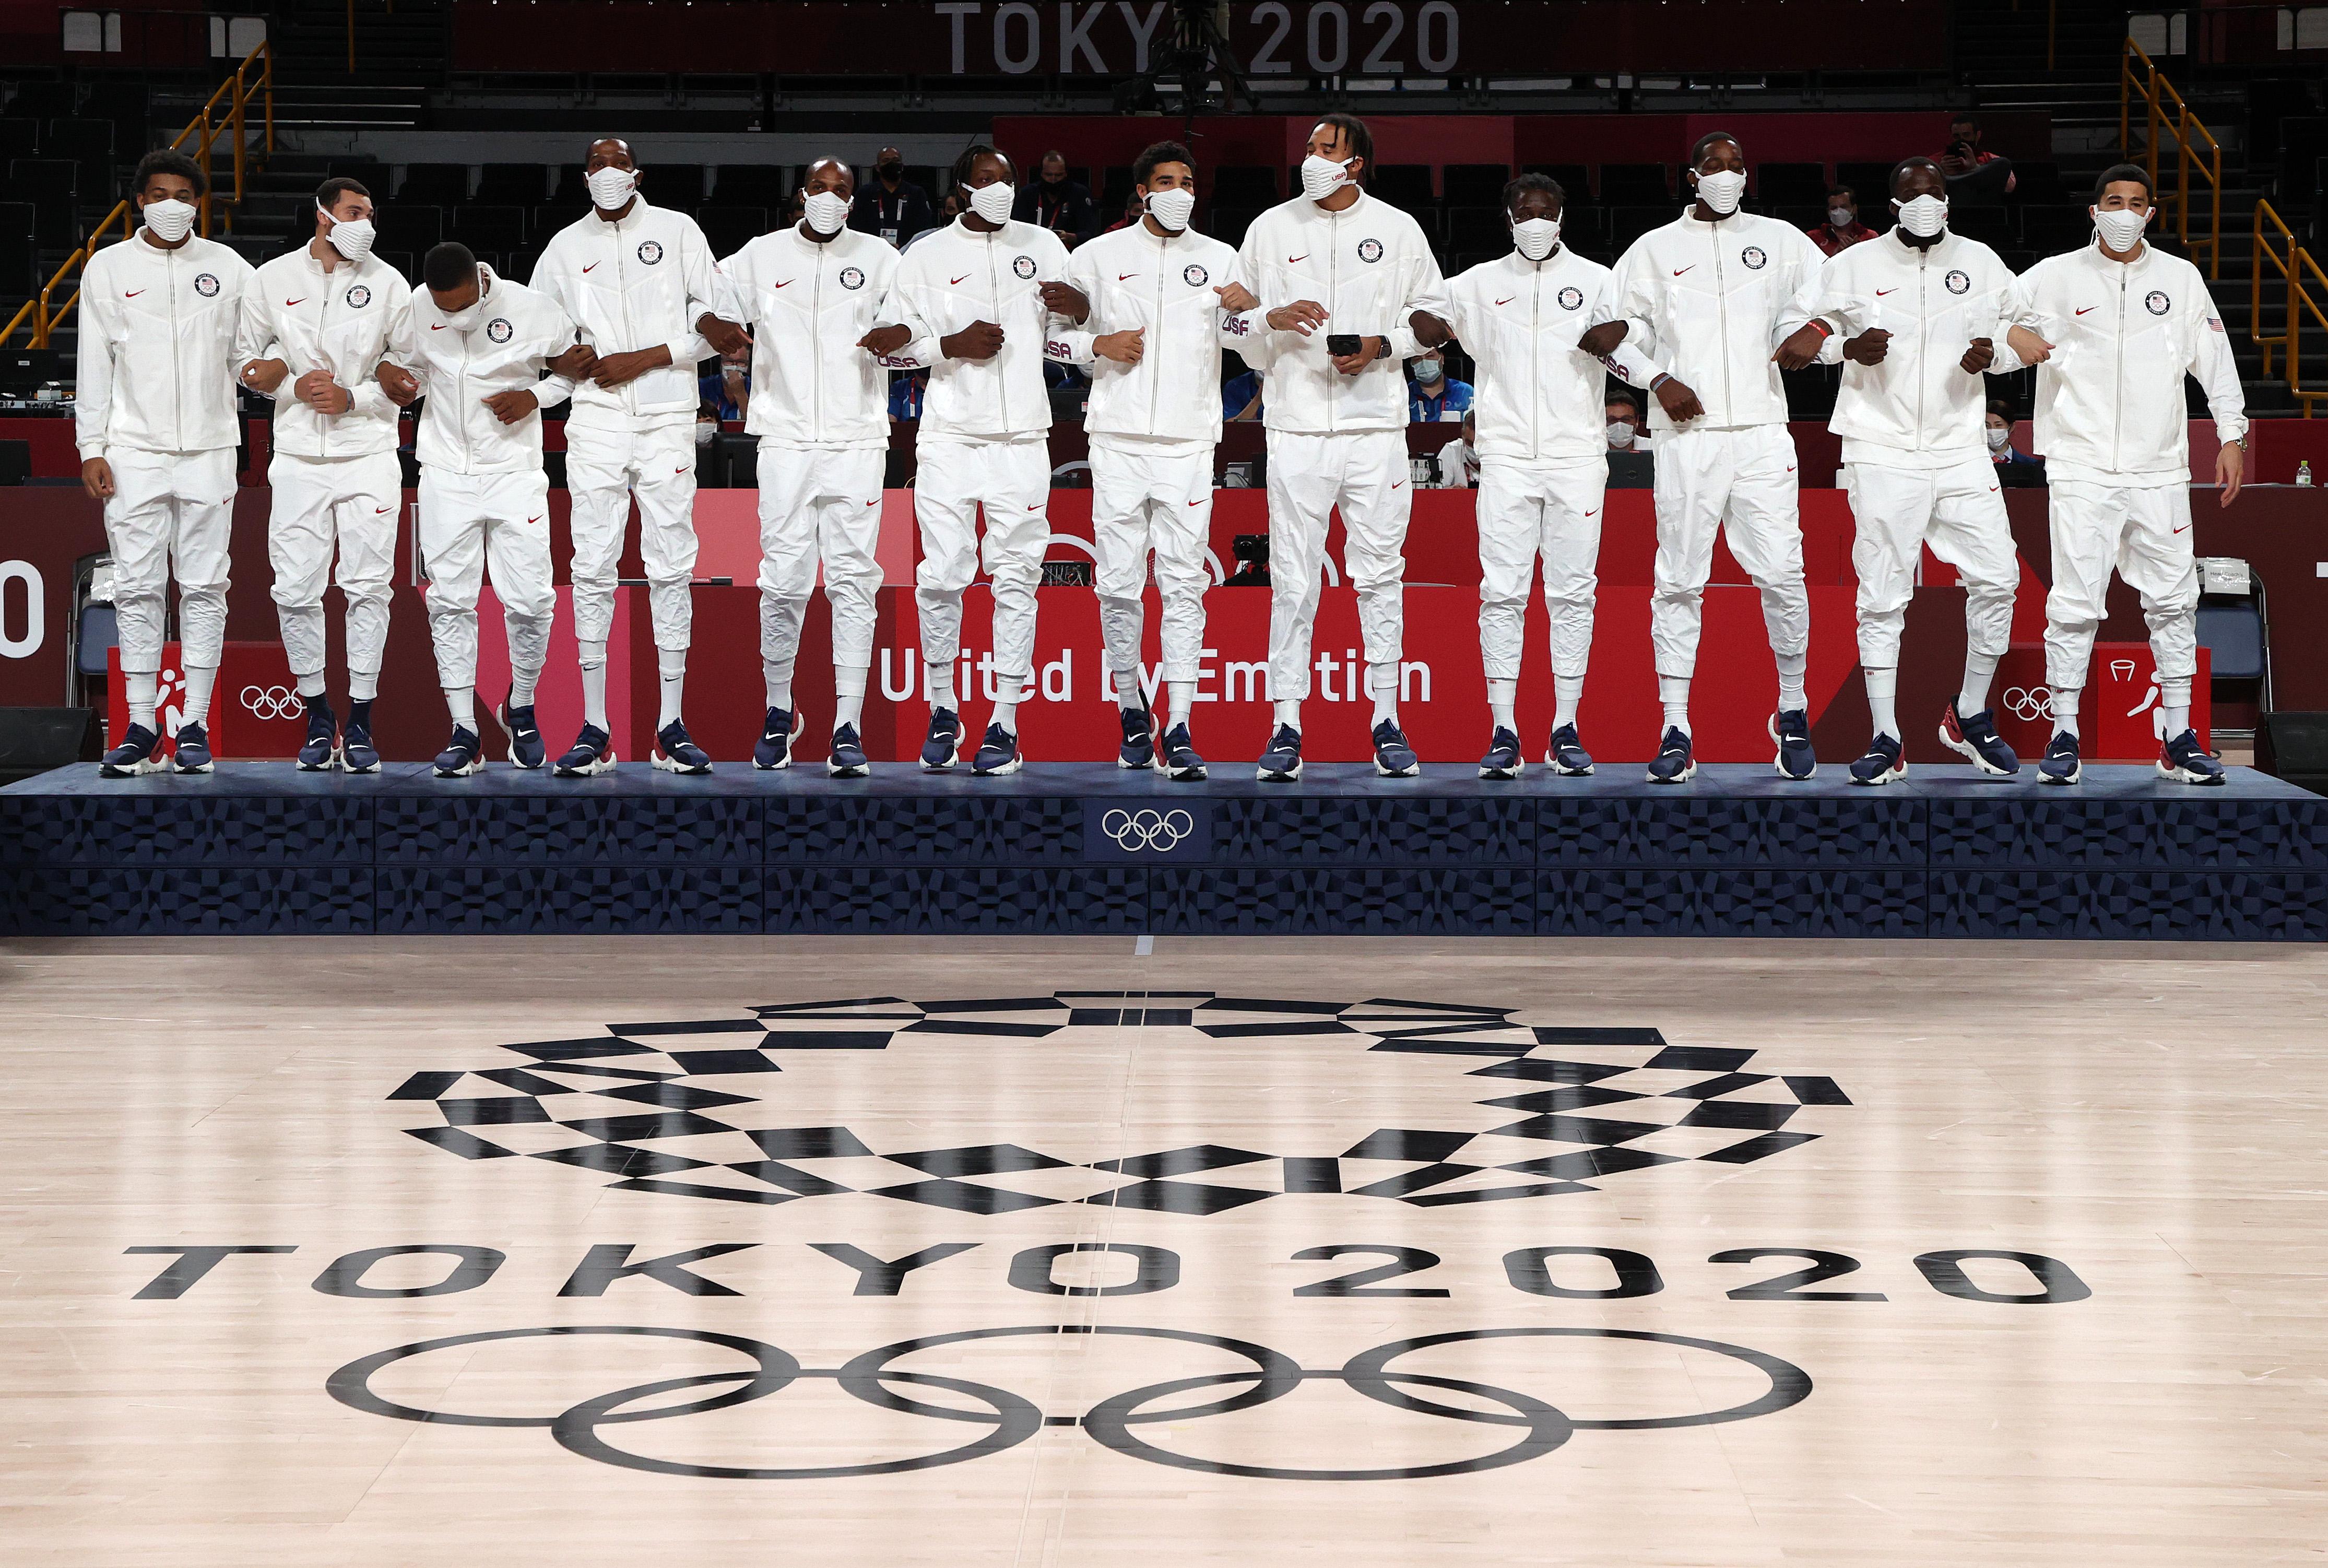 Men's Basketball Medal Ceremony: Day 15